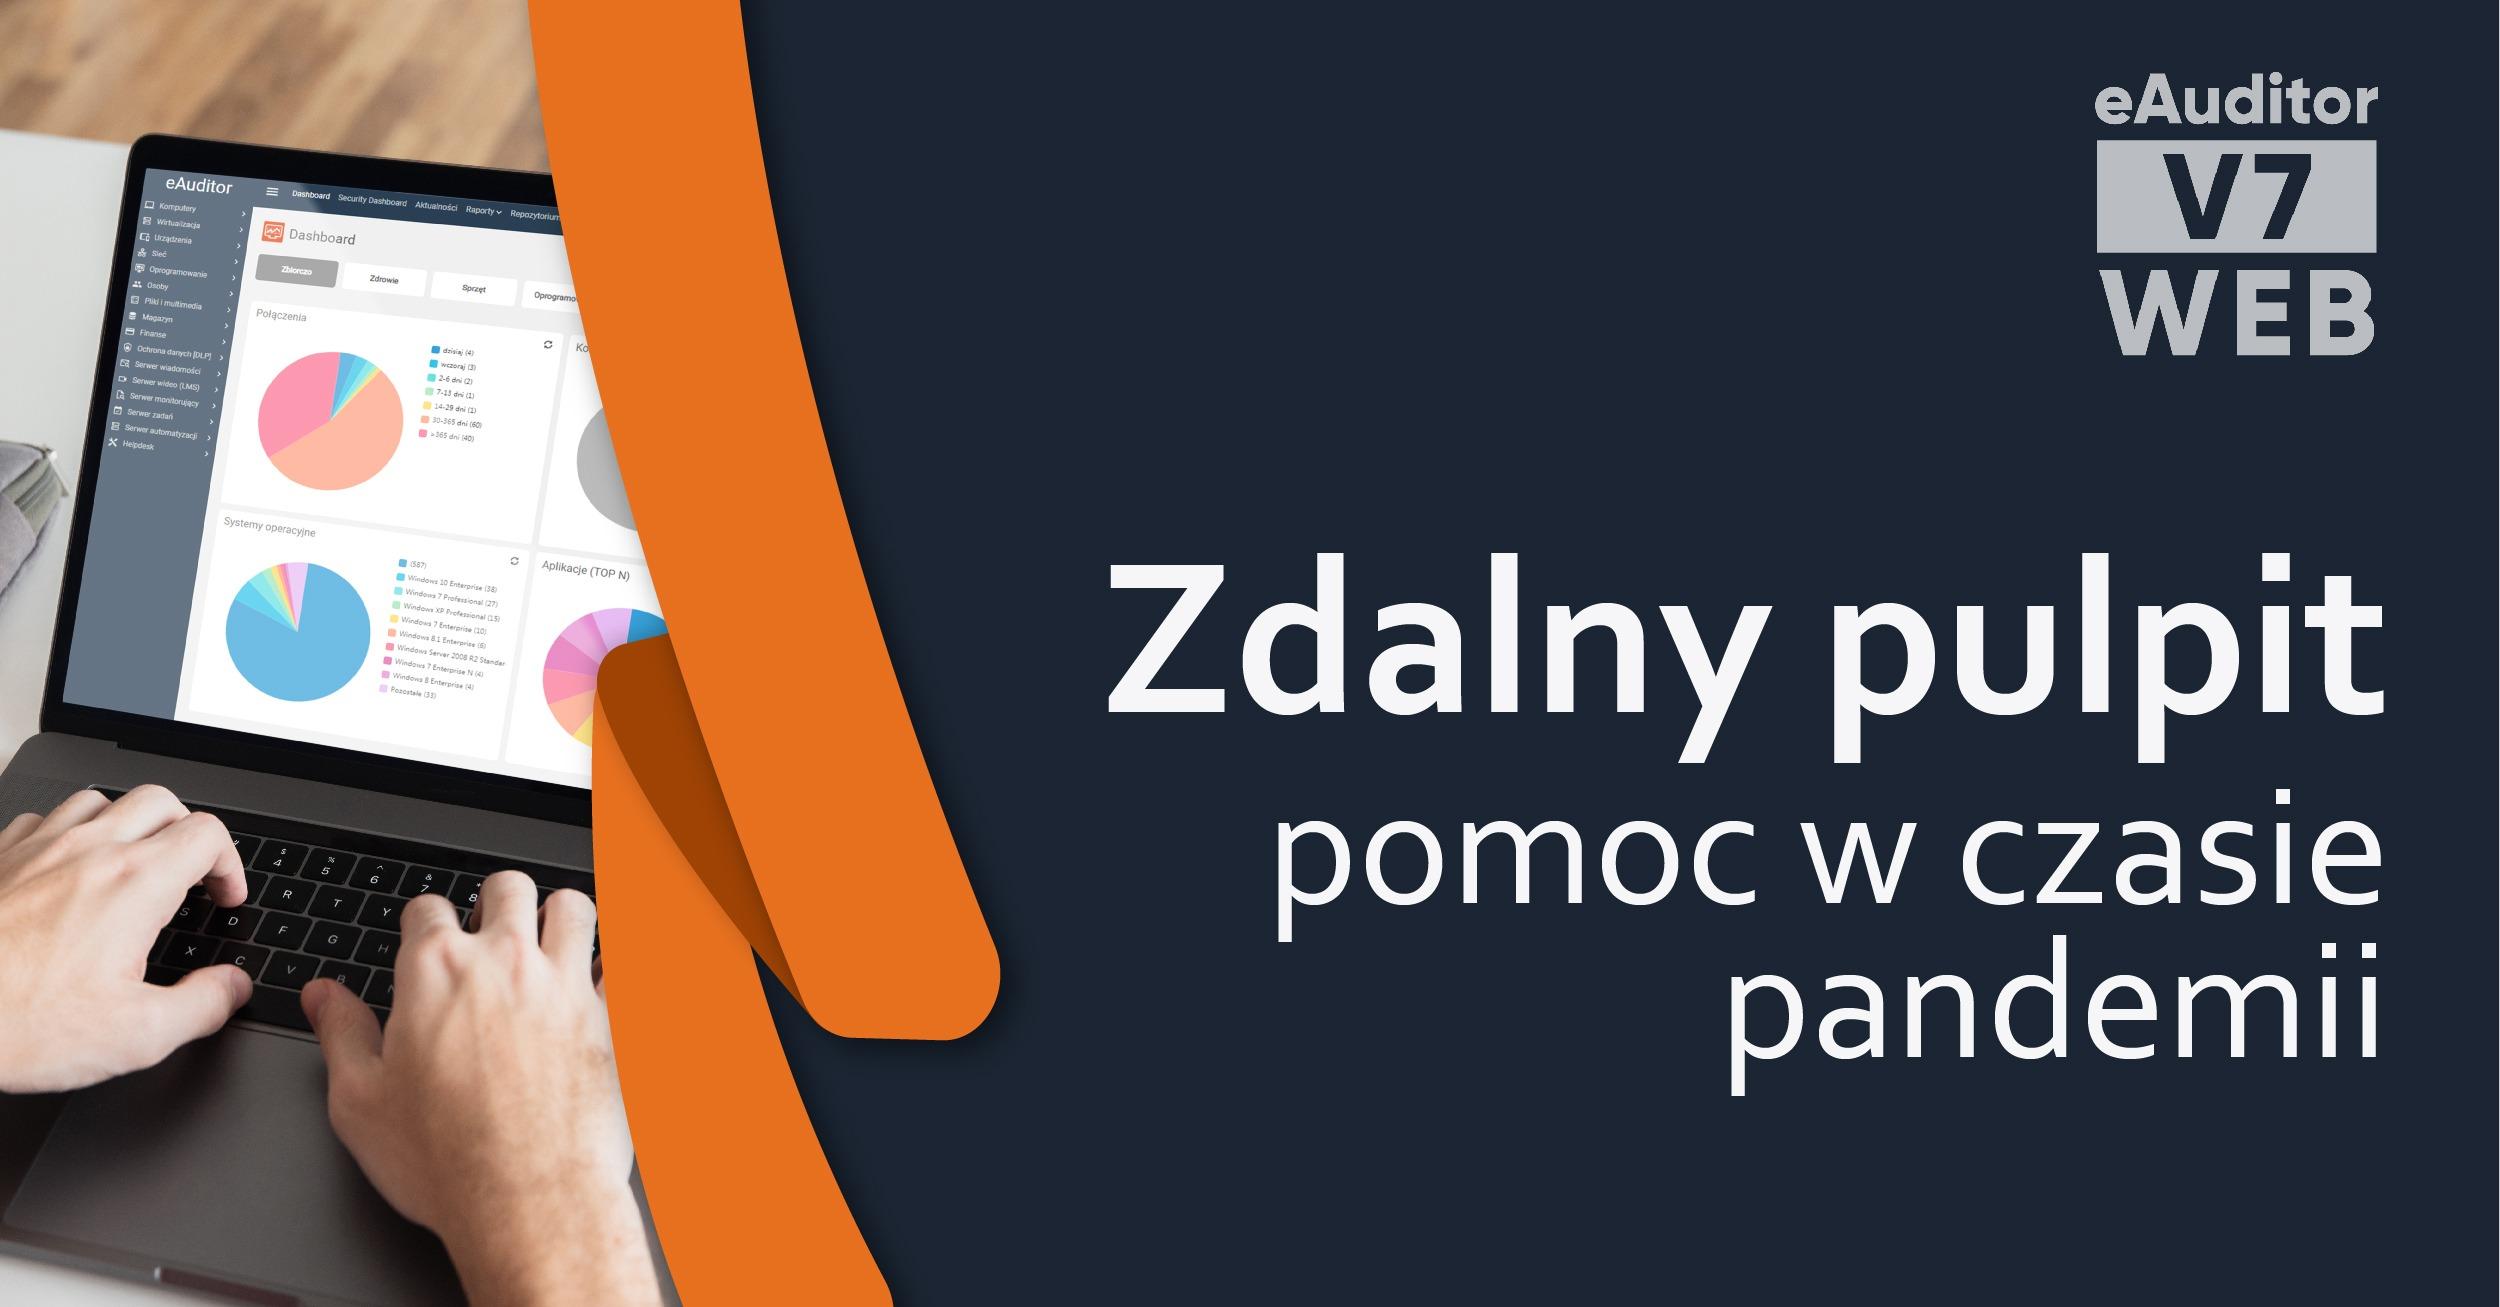 eAuditor Zdalny pulpit - pomoc w czasie pandemii